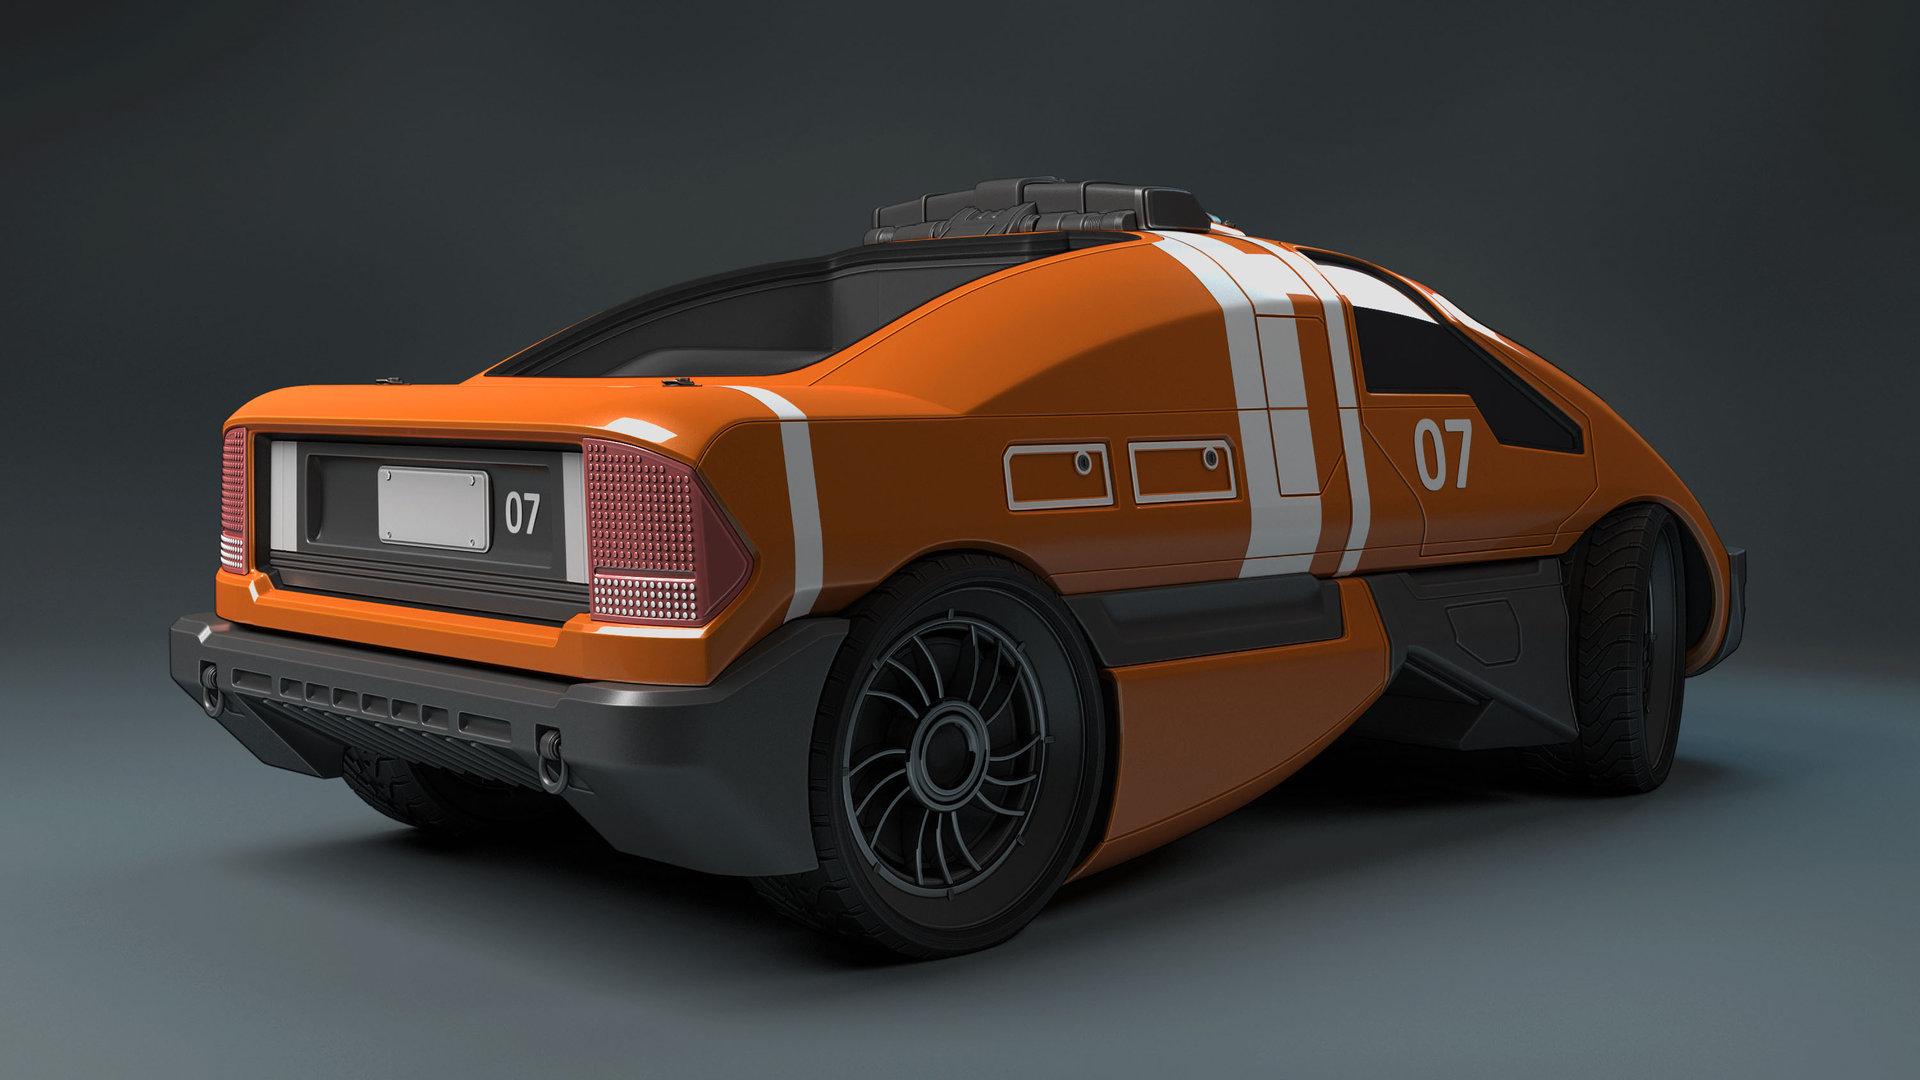 Mark van haitsma concept car back